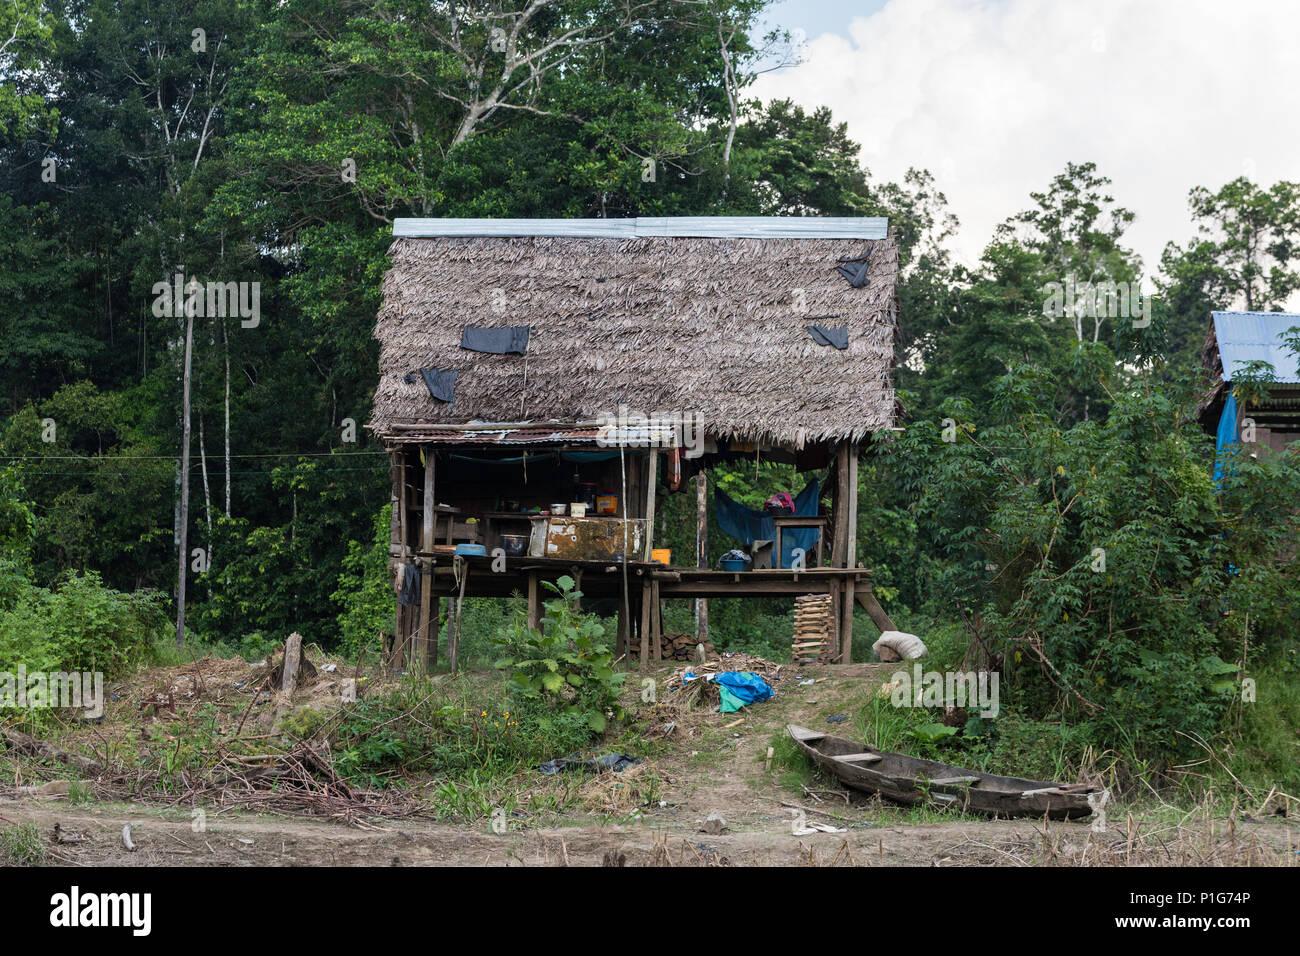 El Dorado Caño, Upper Amazon River Basin, Loreto, Peru. Copyright 2016 Michael S. Nolan. All rights reserved worldwide. - Stock Image